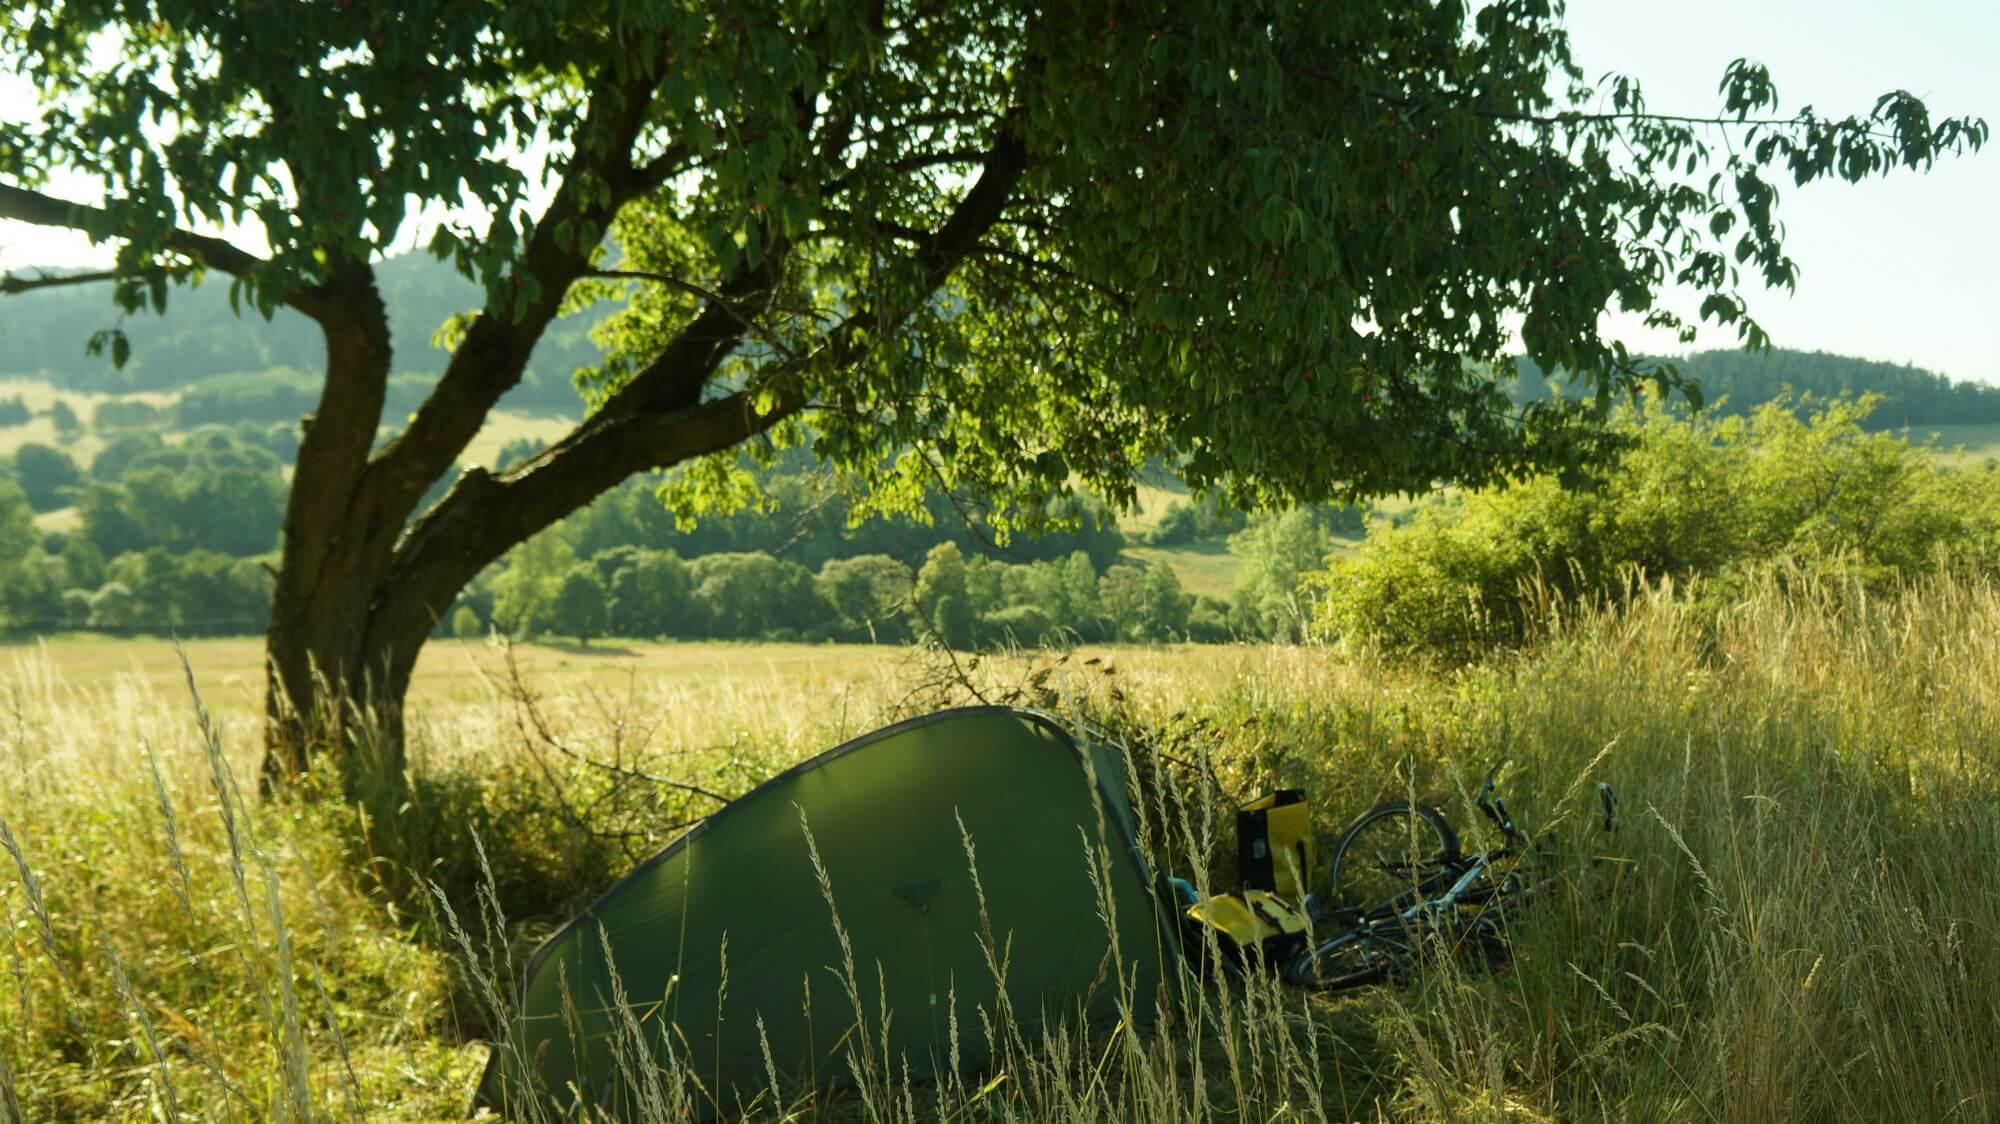 kotlina-klodzka-namiot-wisnia